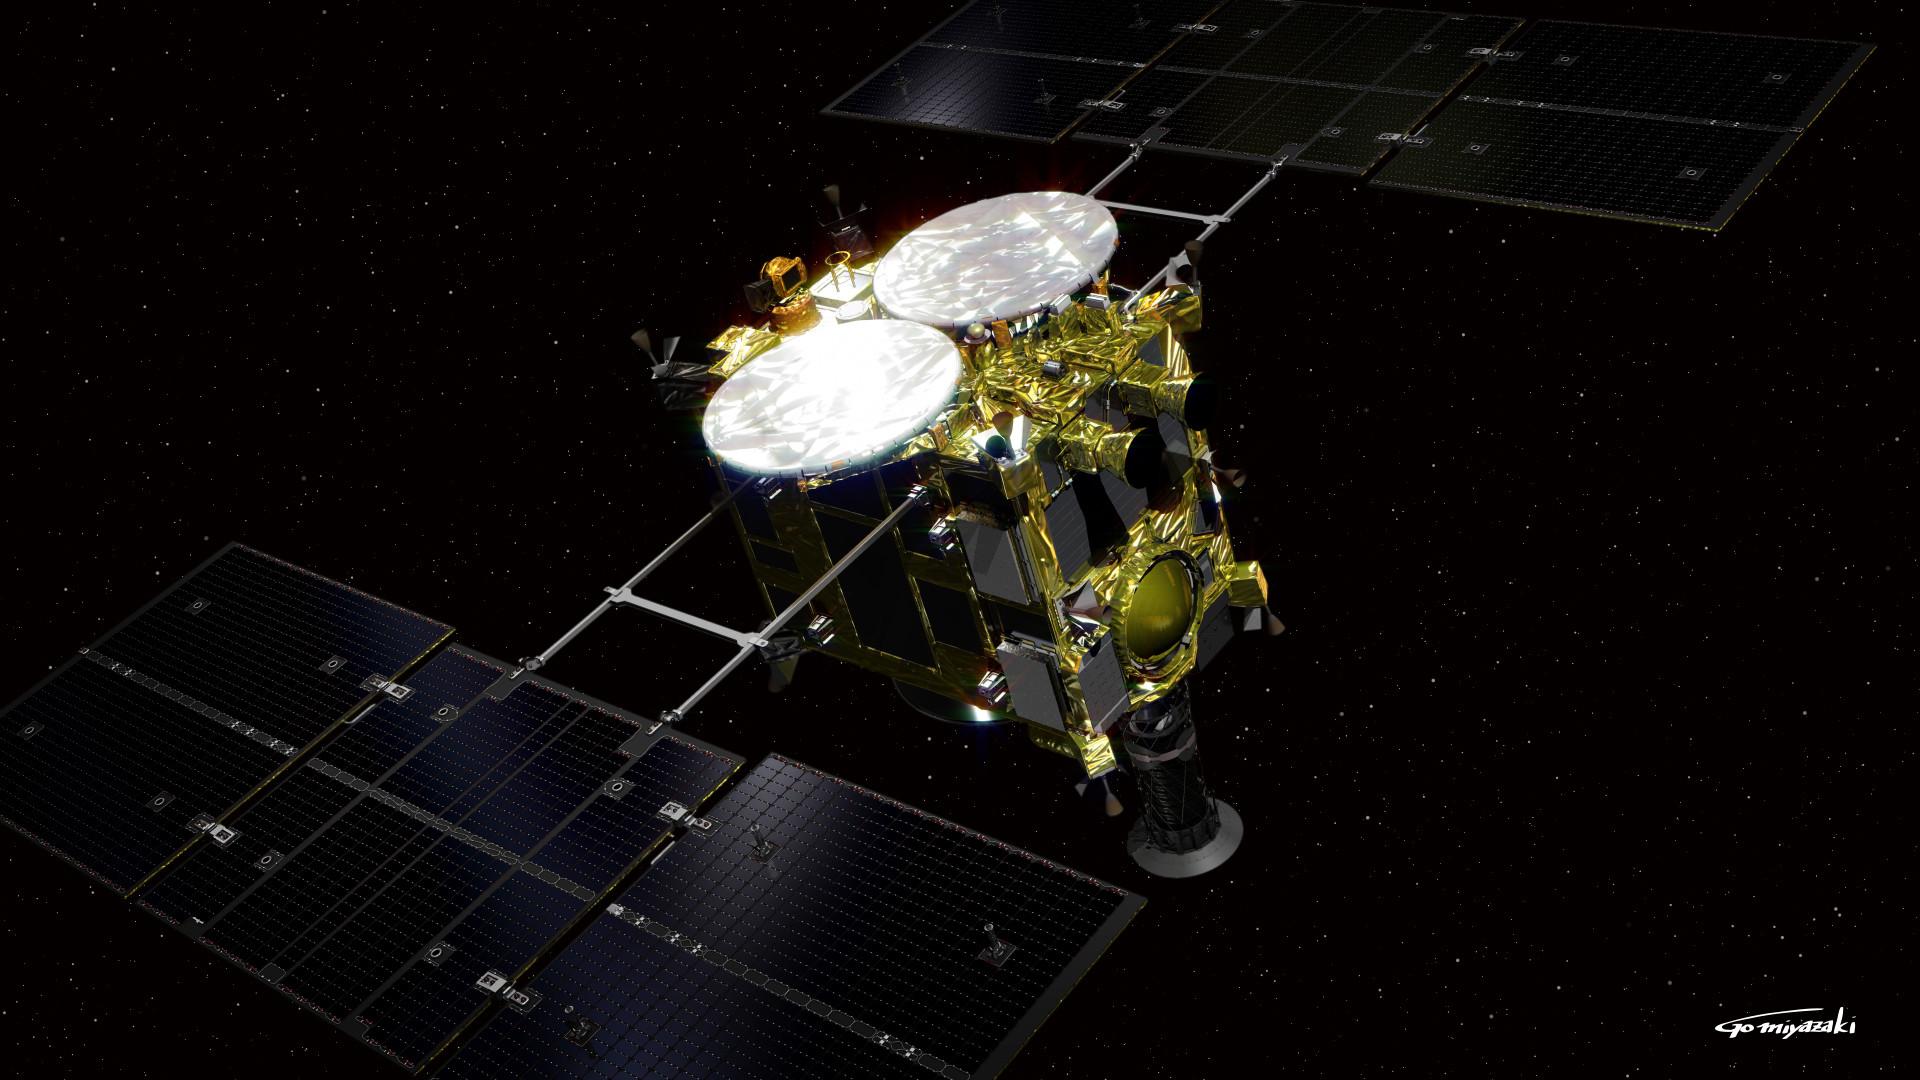 Зонд «Хаябуса-2» готов кпосадке наастероид Рюгу